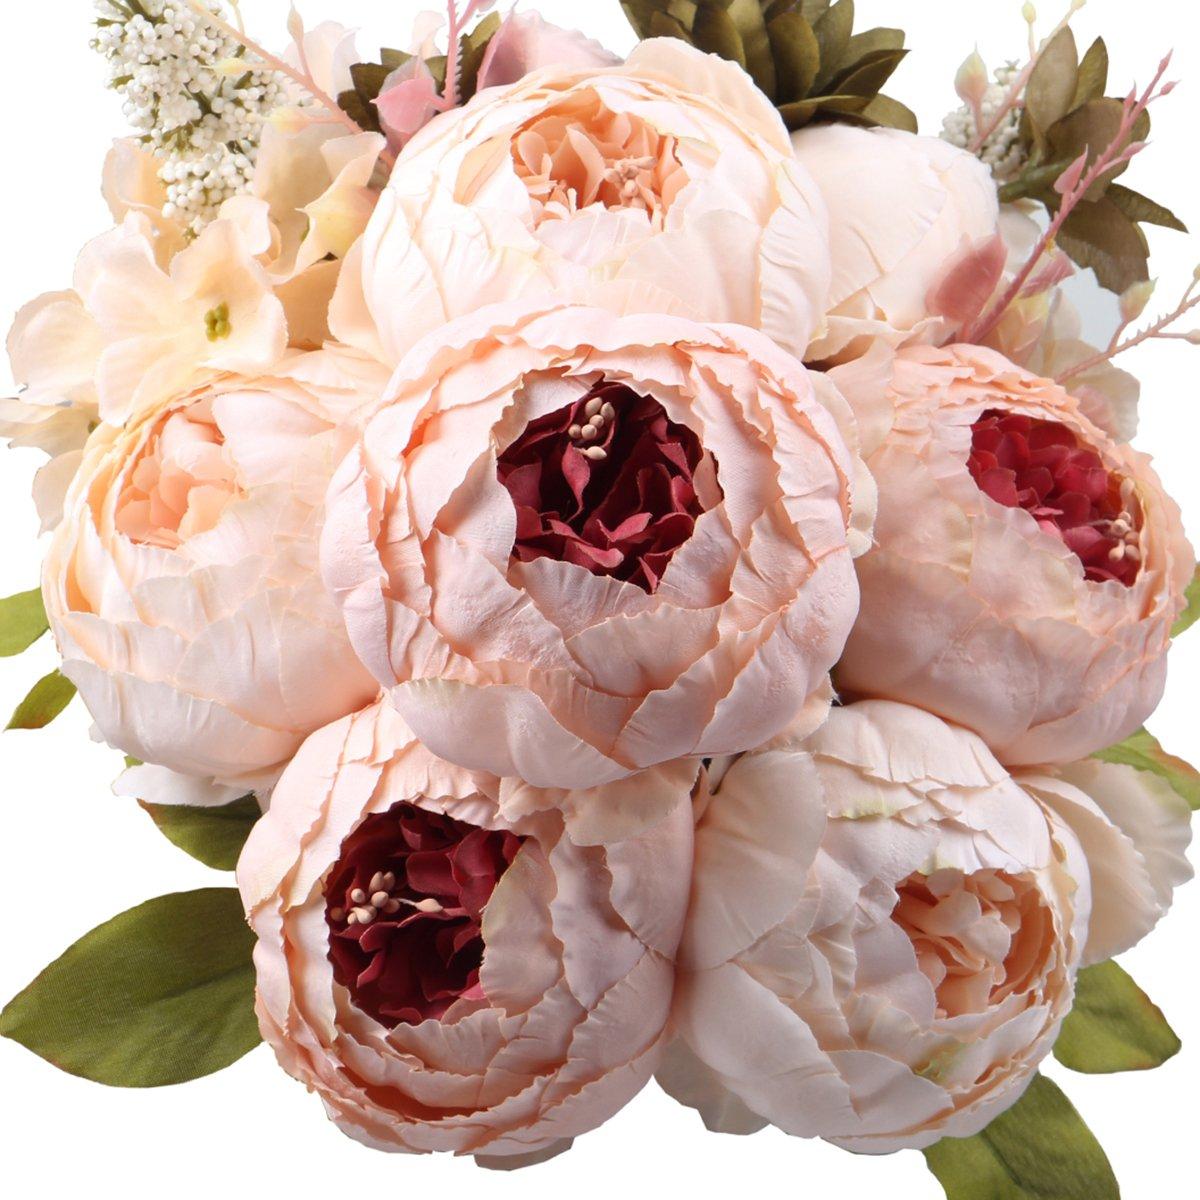 Soft Flower Vintage Artificial Peonysilk Flowers Bouquet Decor